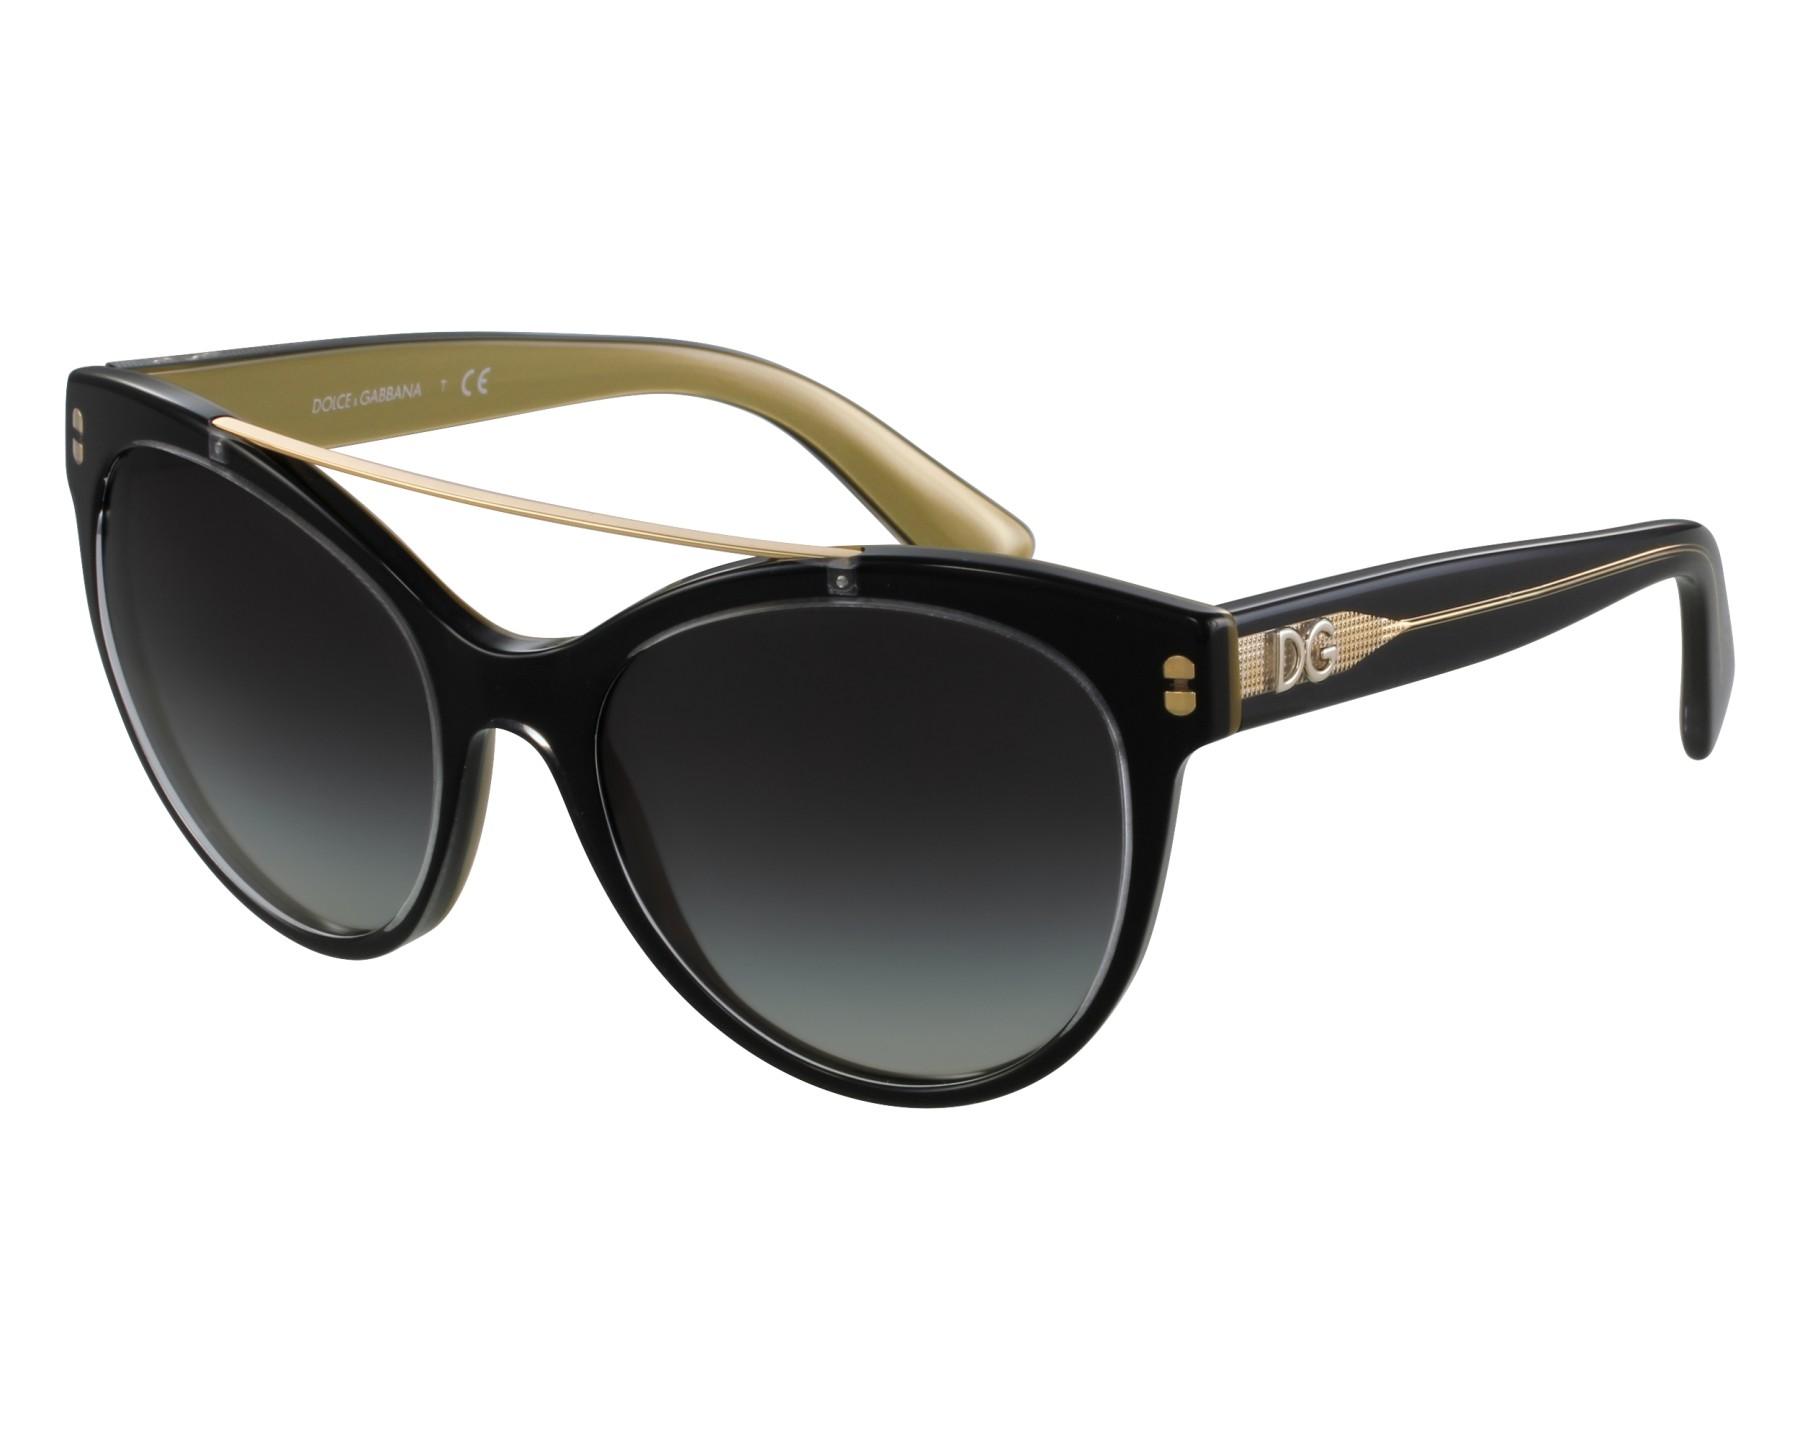 3e4ae0cfd2d3 thumbnail Sunglasses Dolce   Gabbana DG-4280 2955 8G - Grey Gold front view